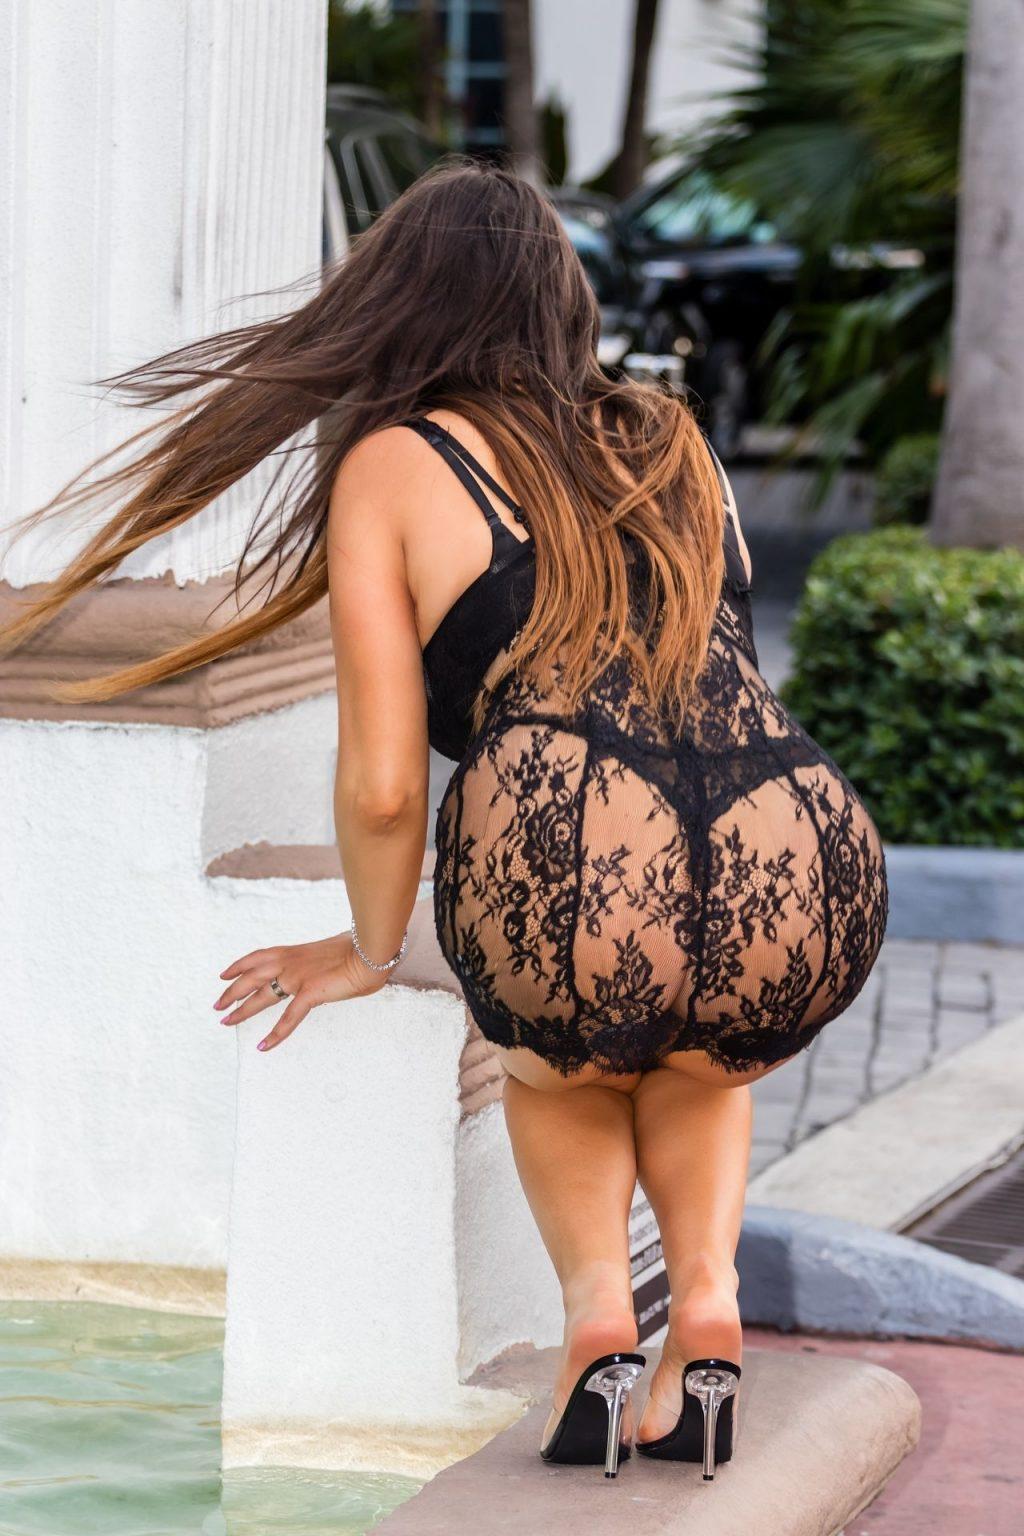 Claudia Romani (13 Hot Photos)